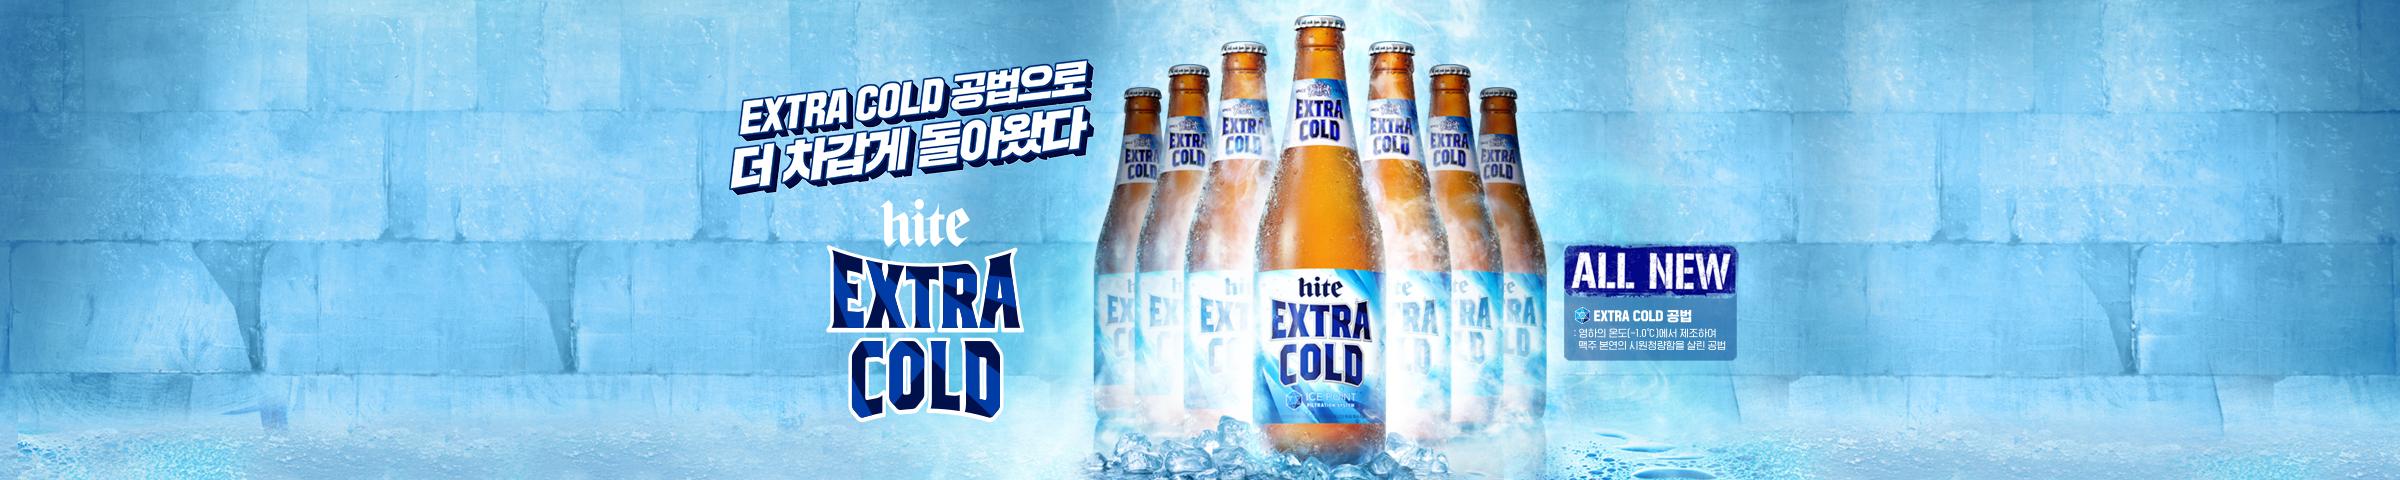 hite EXTRA COLD